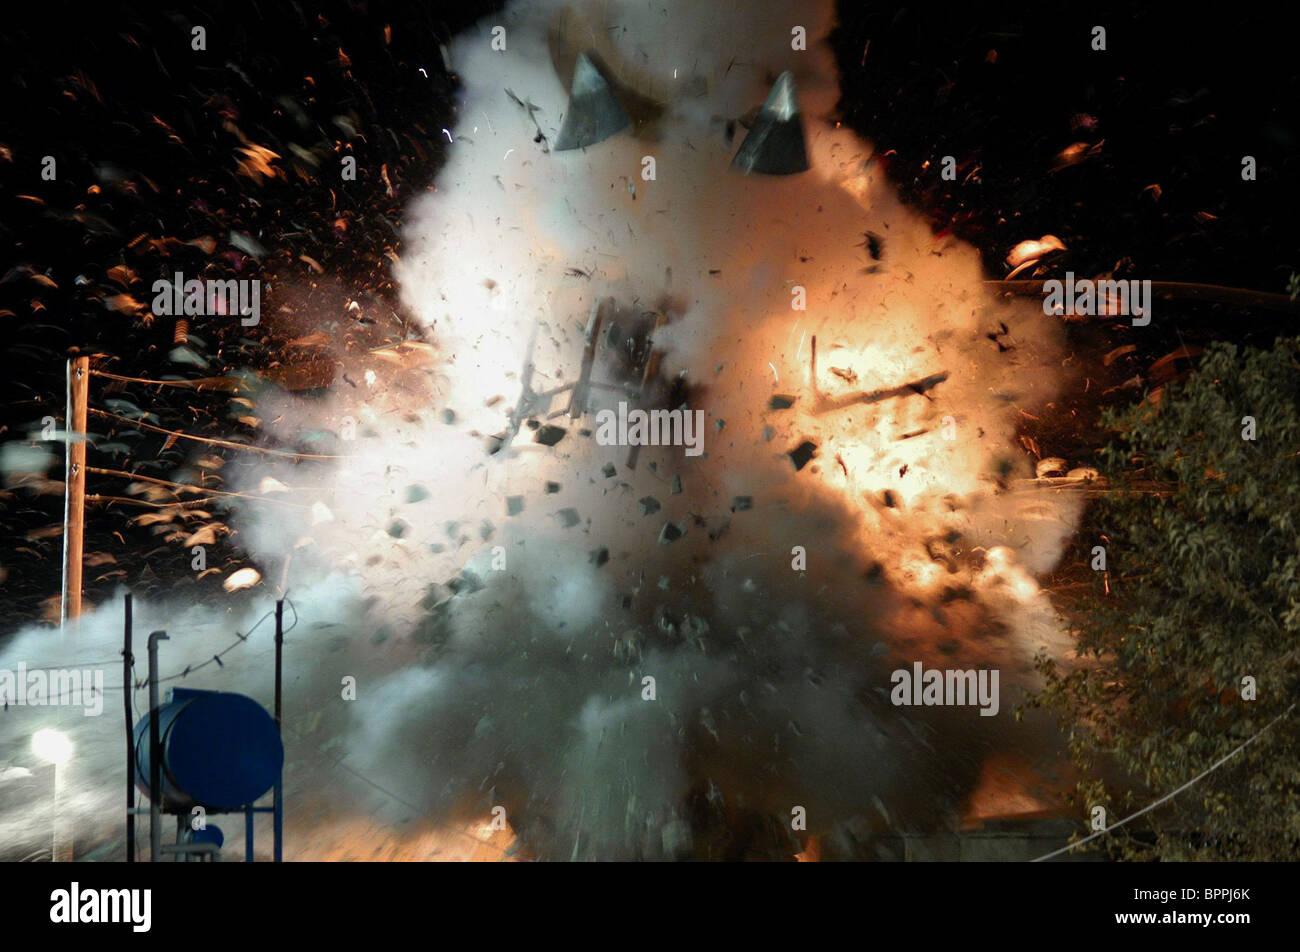 EXPLOSION SCENE VALLEY OF THE WOLVES: IRAQ; KURTLAR VADISI - IRAK (2006) - Stock Image